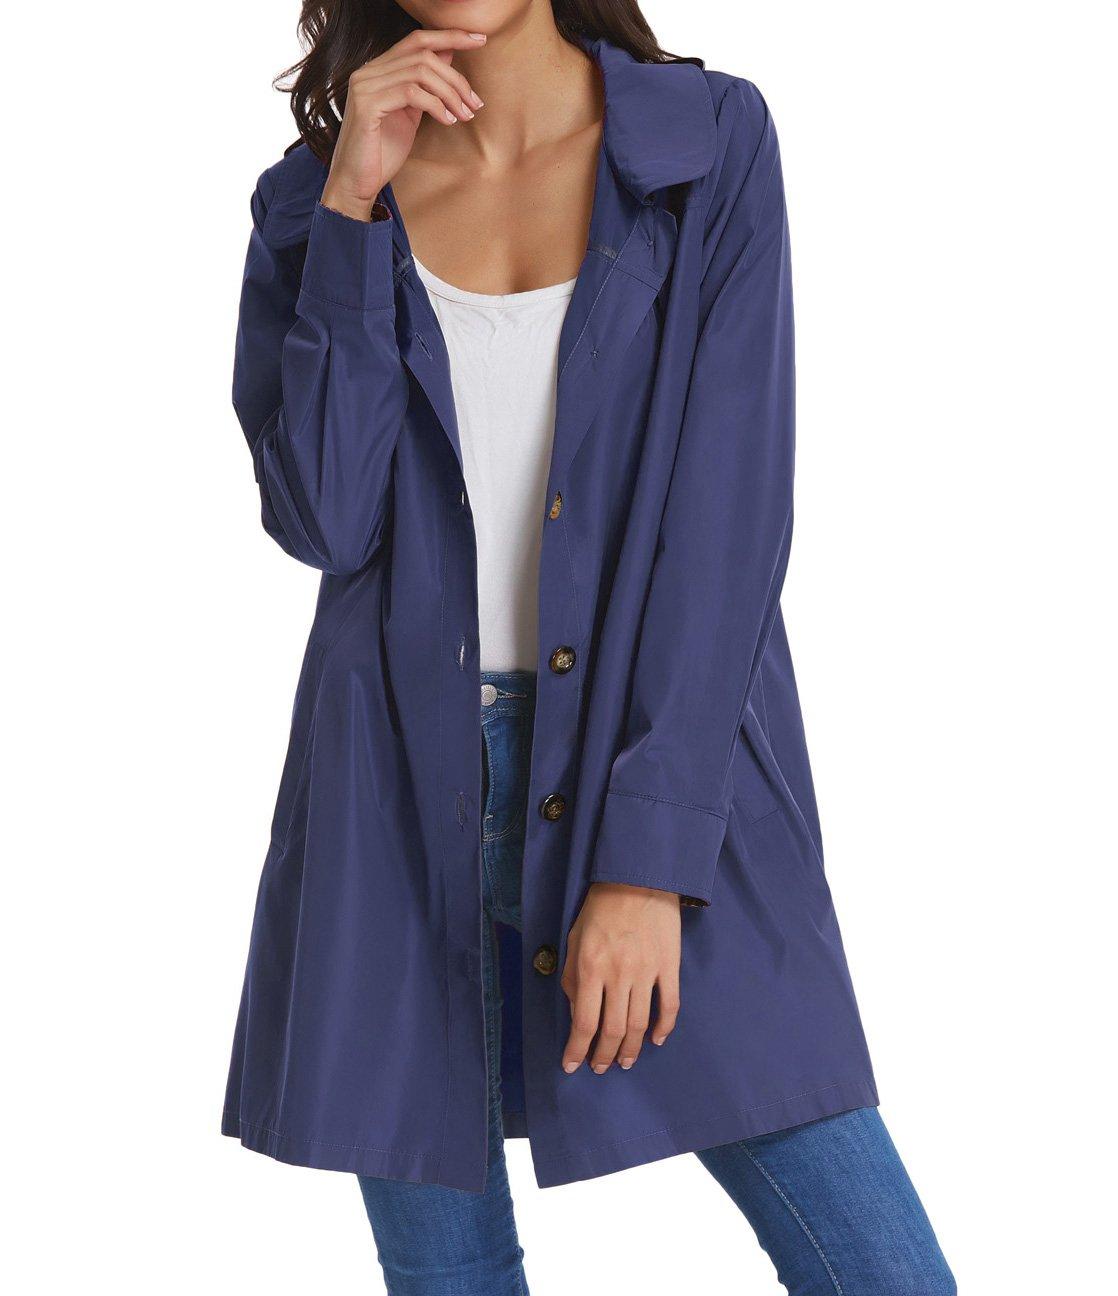 Women's Waterproof Lightweight Rain Jacket Anorak with Hood KK822-2 XL Navy Blue